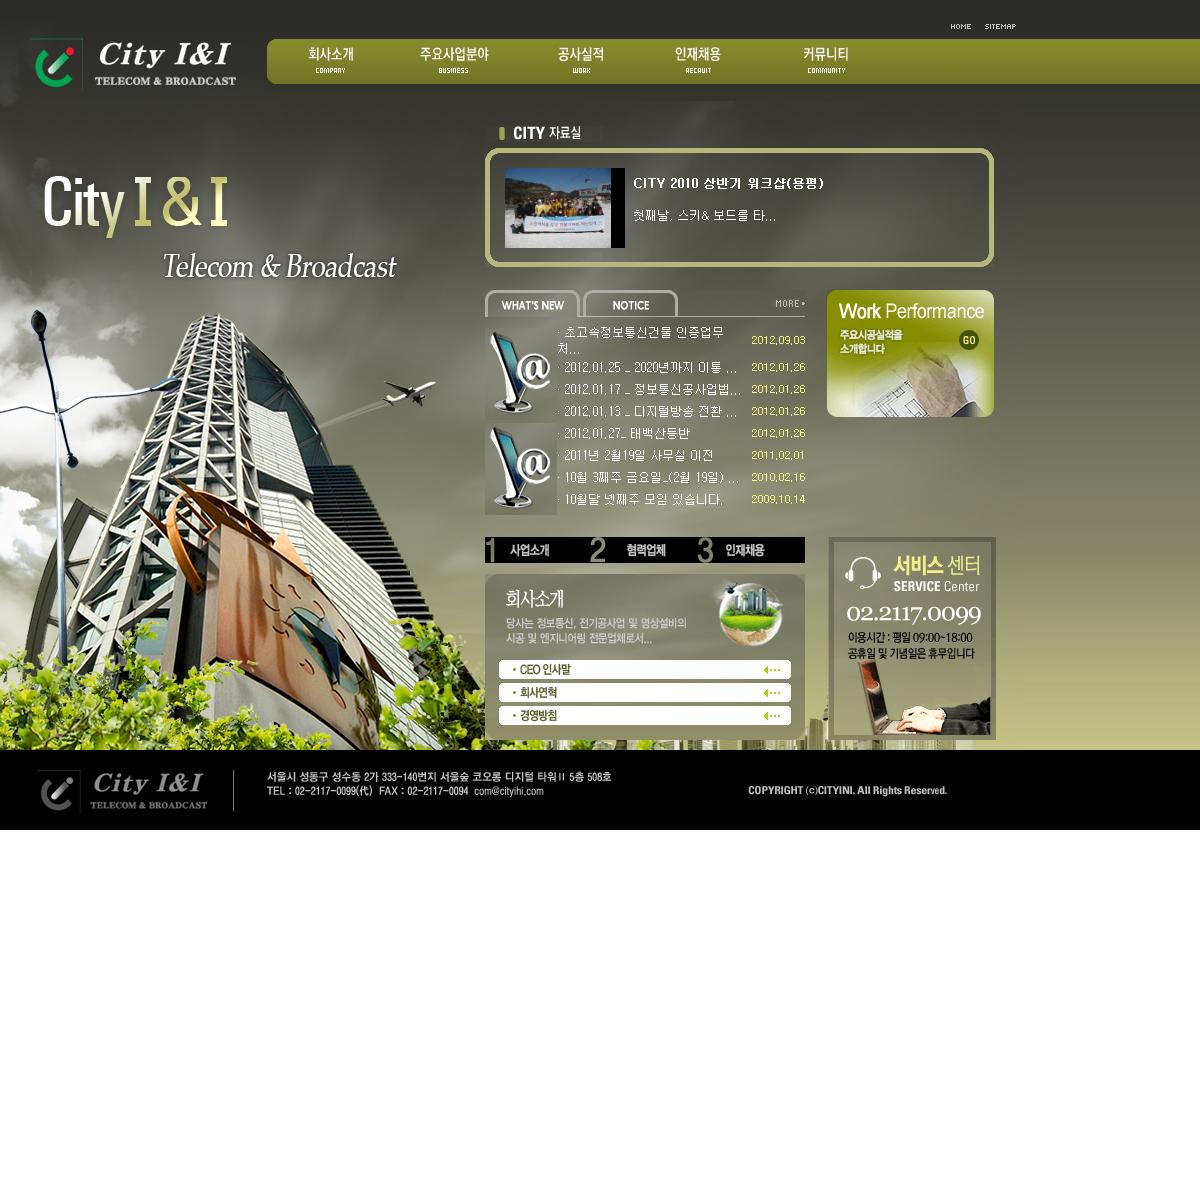 City I&I에 오신것을 환영합니다.